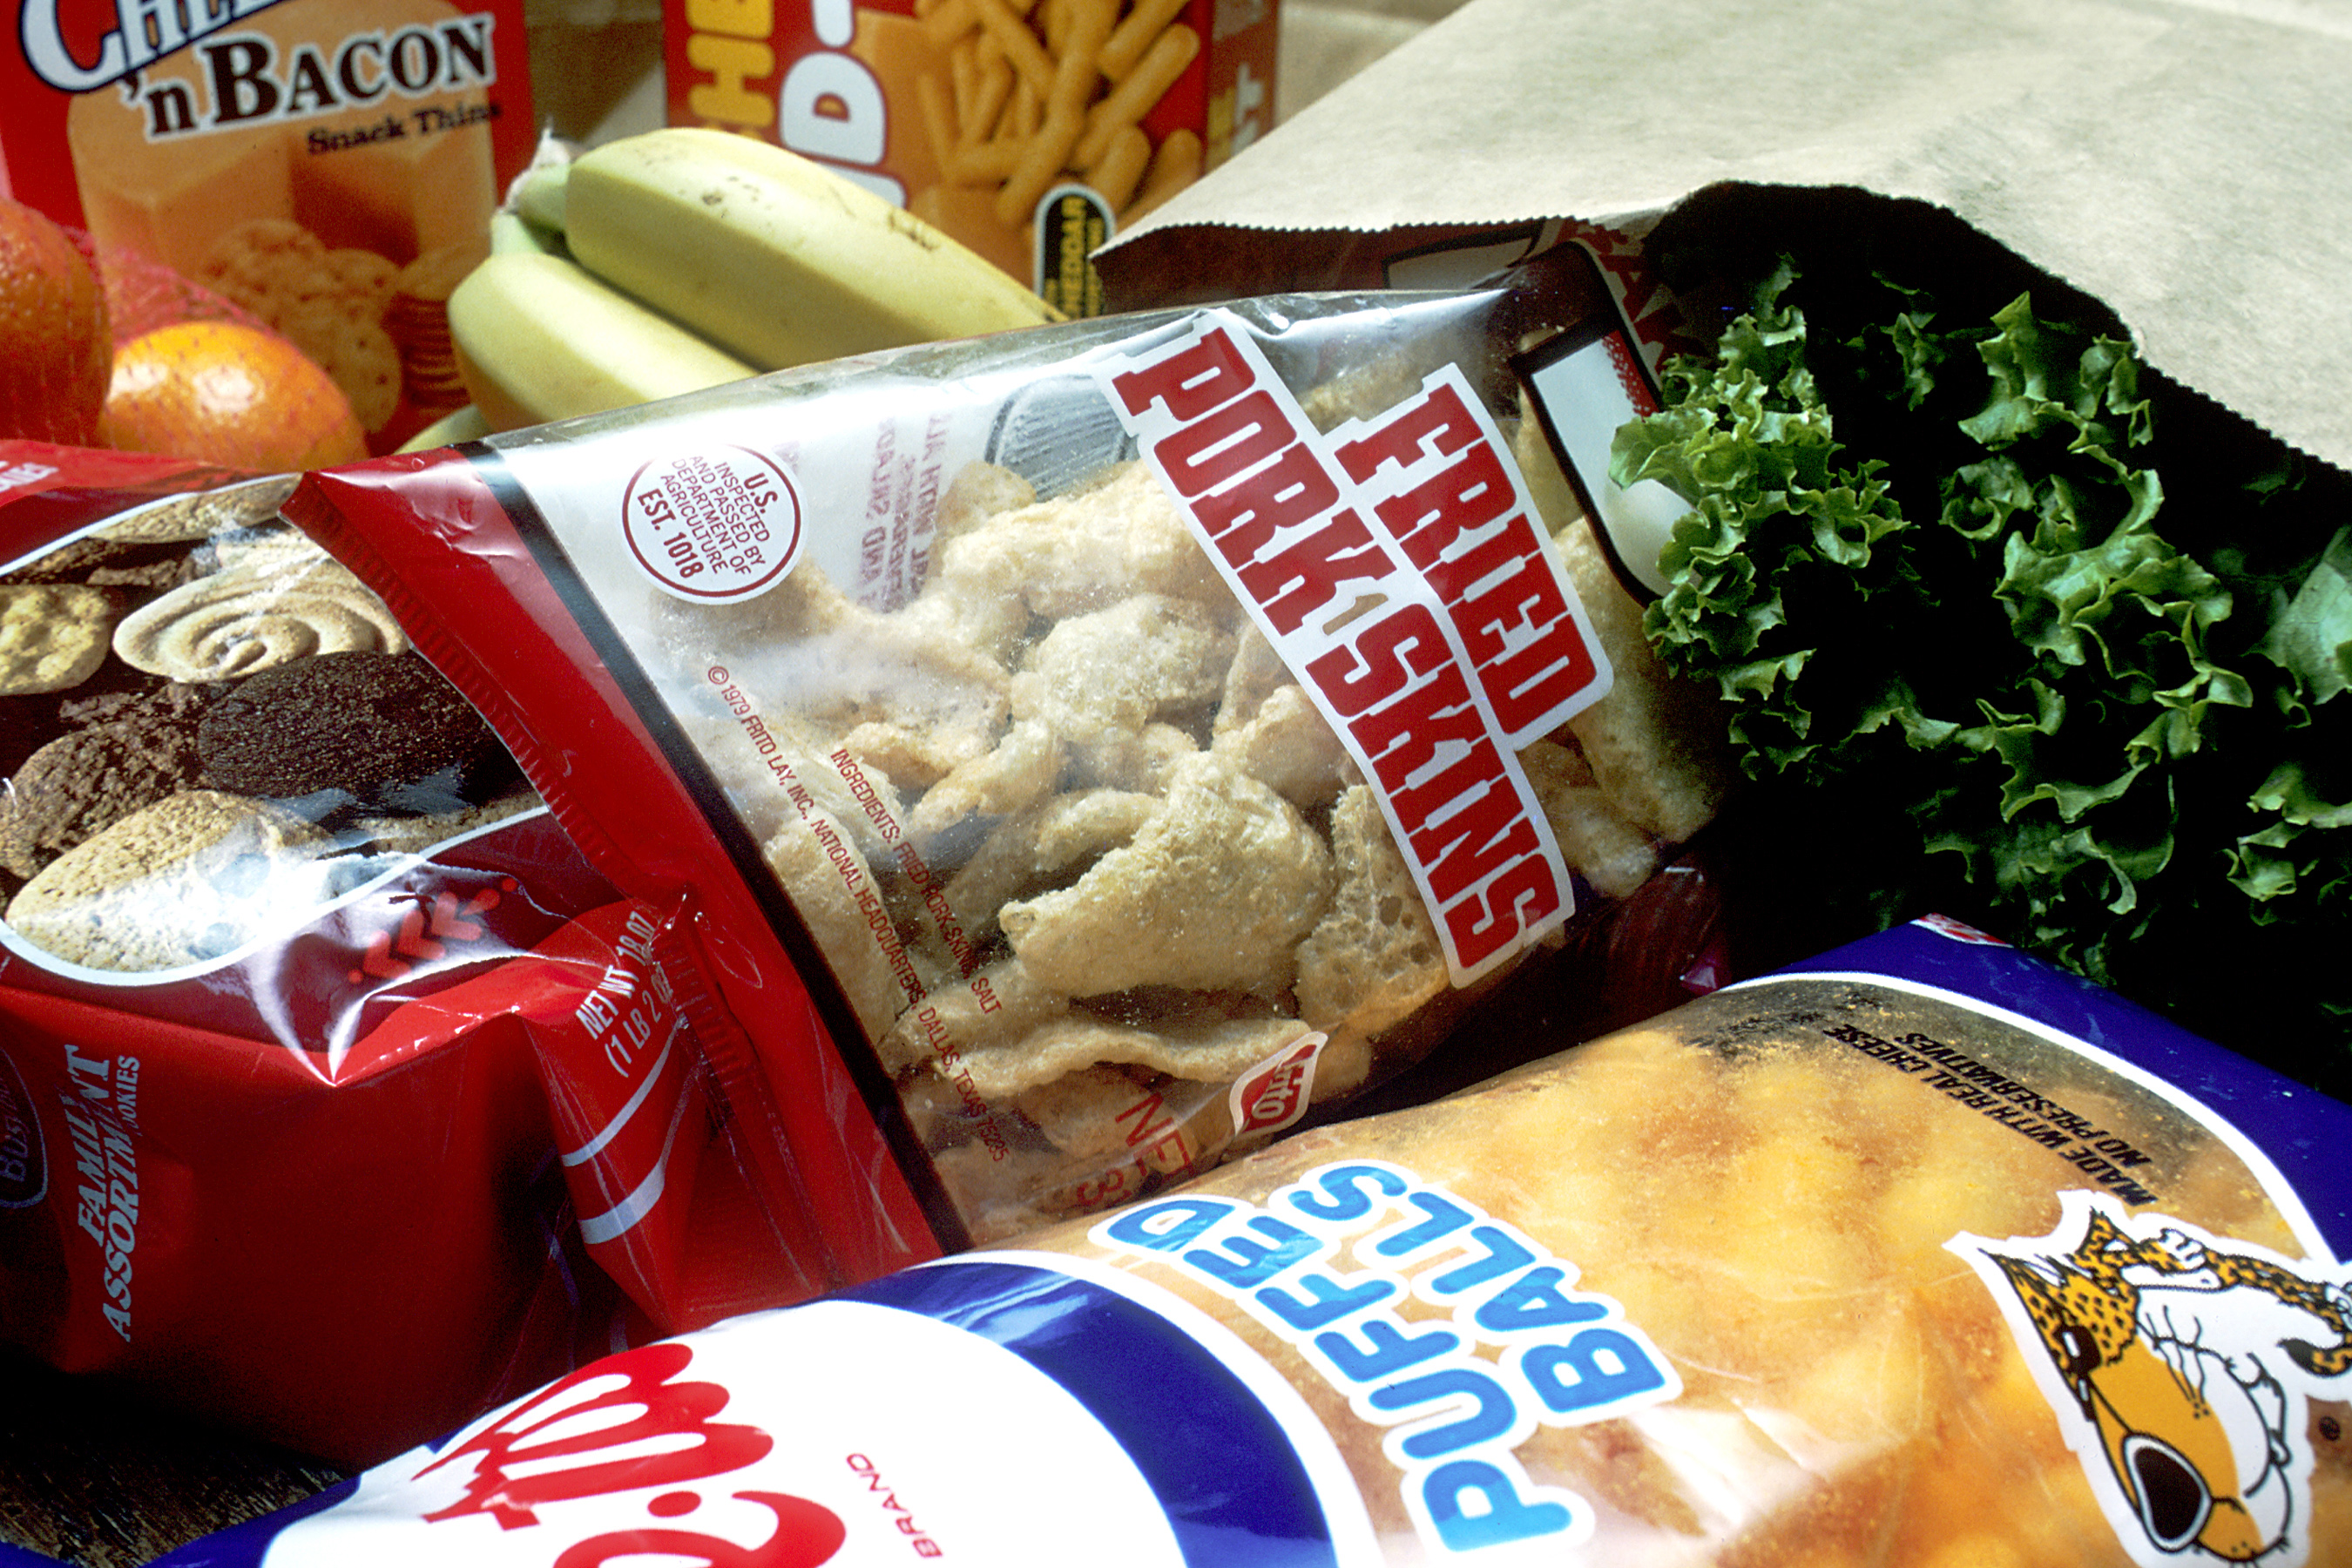 Junk Foods Bag of junk foods.jpg